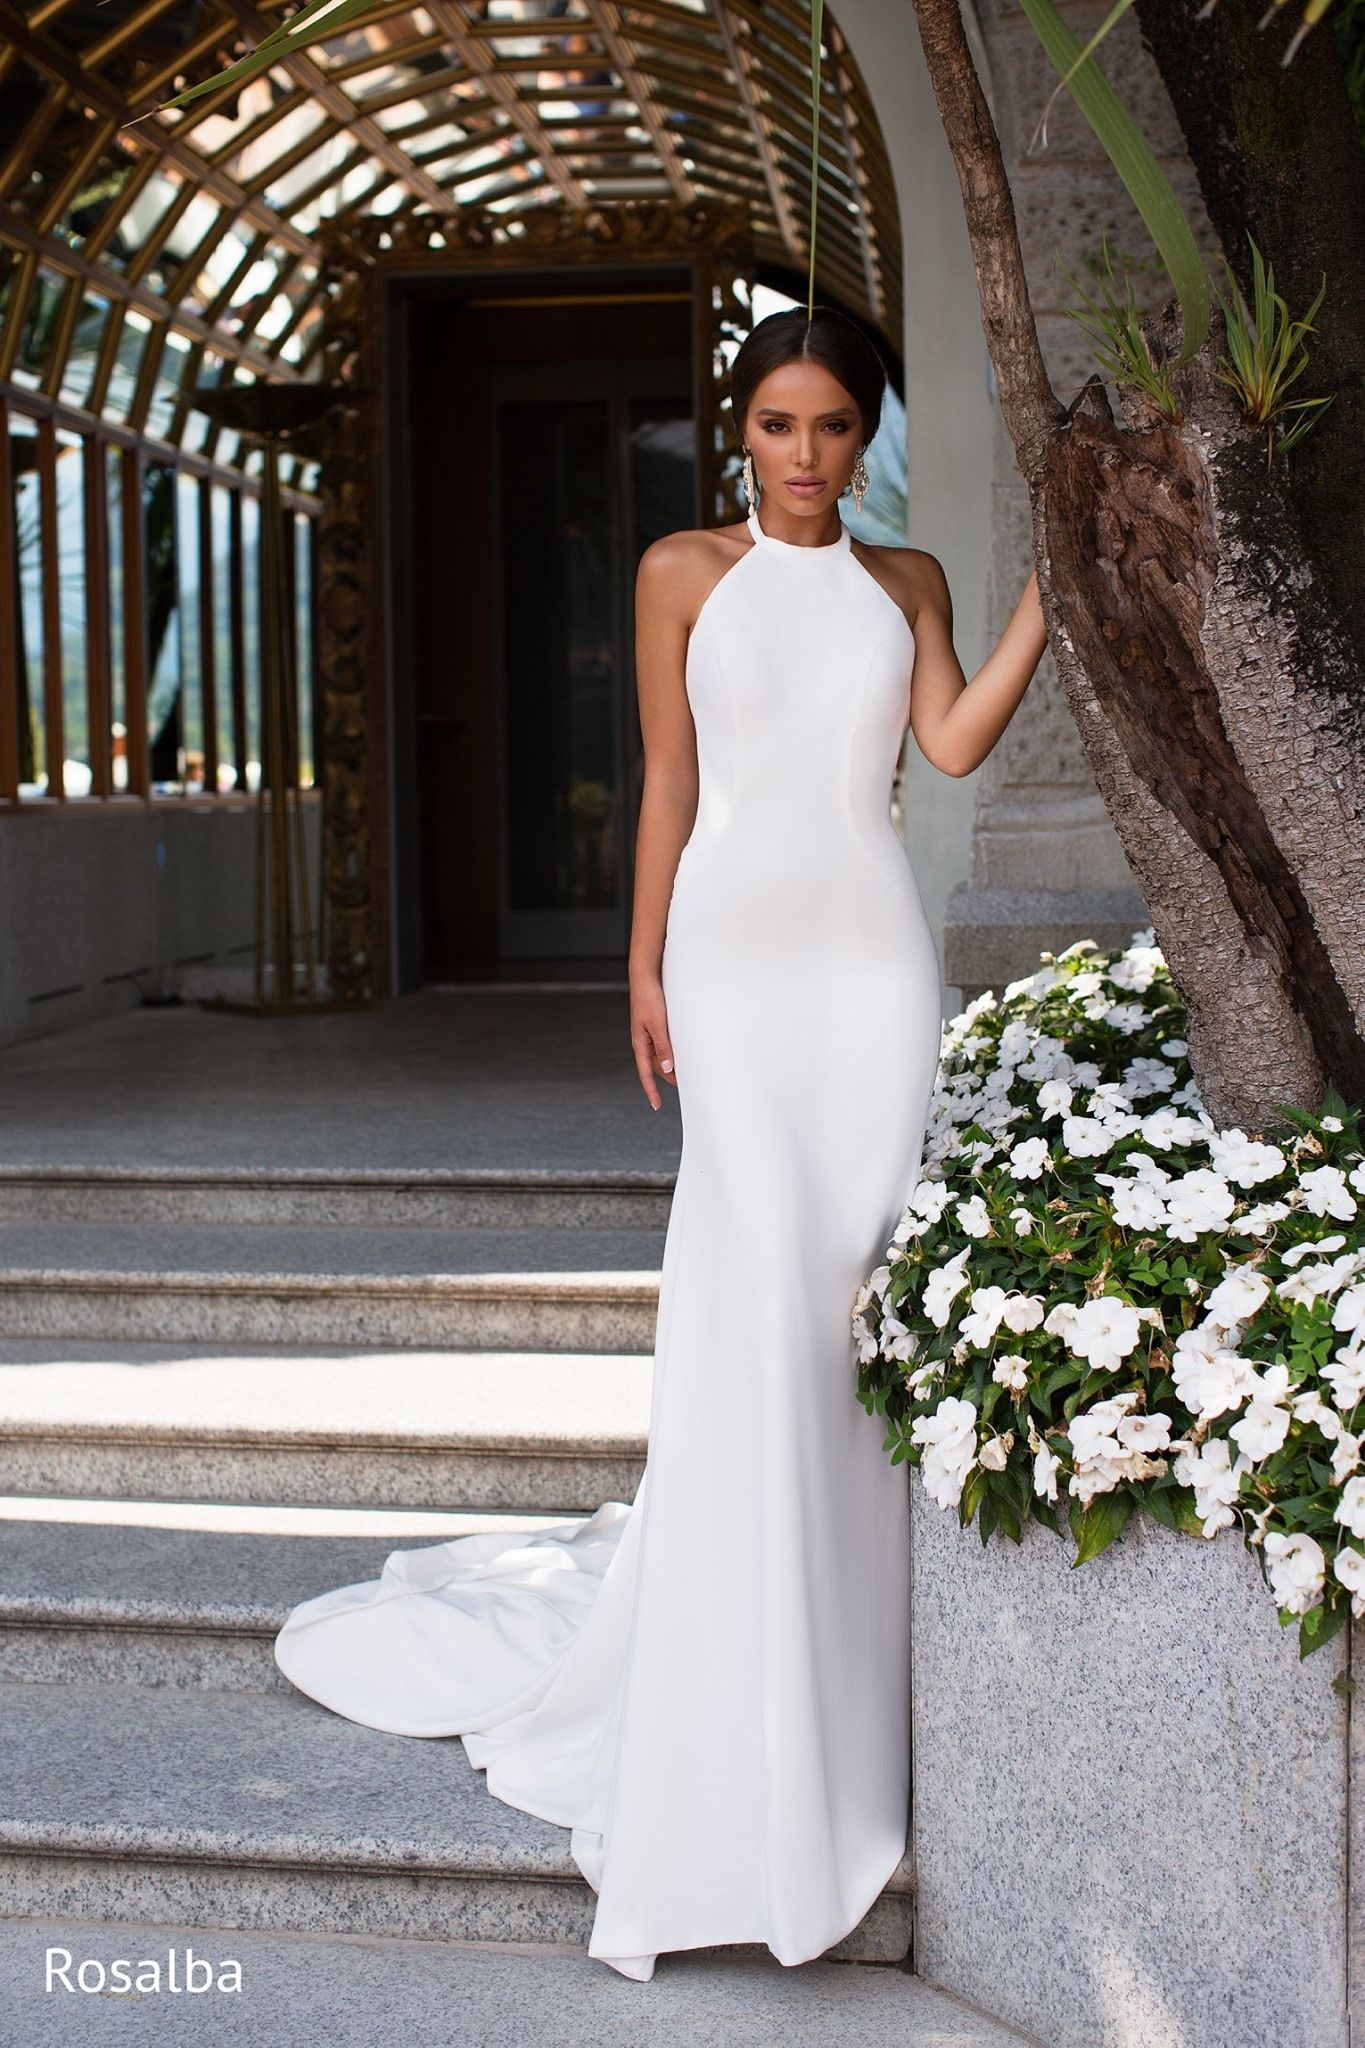 Giovanna Alessandro Rosalba Wedding Dress Wedding Dresses Second Wedding Dresses Wedding Dresses Simple